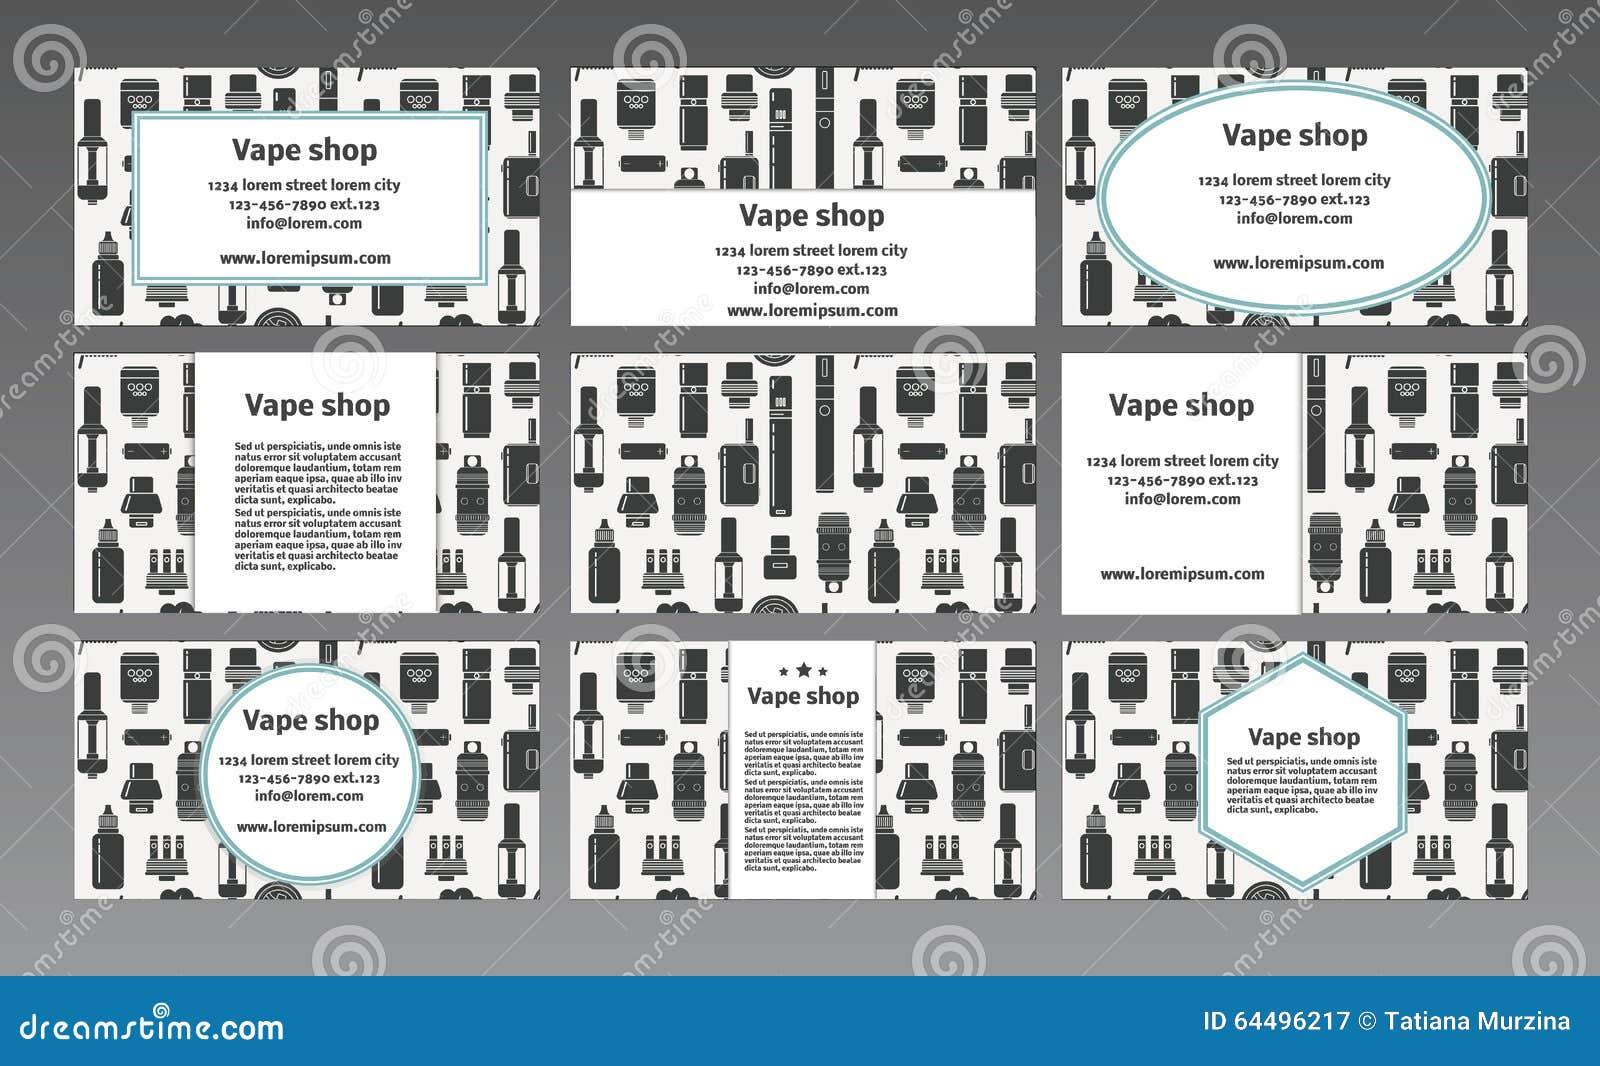 Vapor store business plan